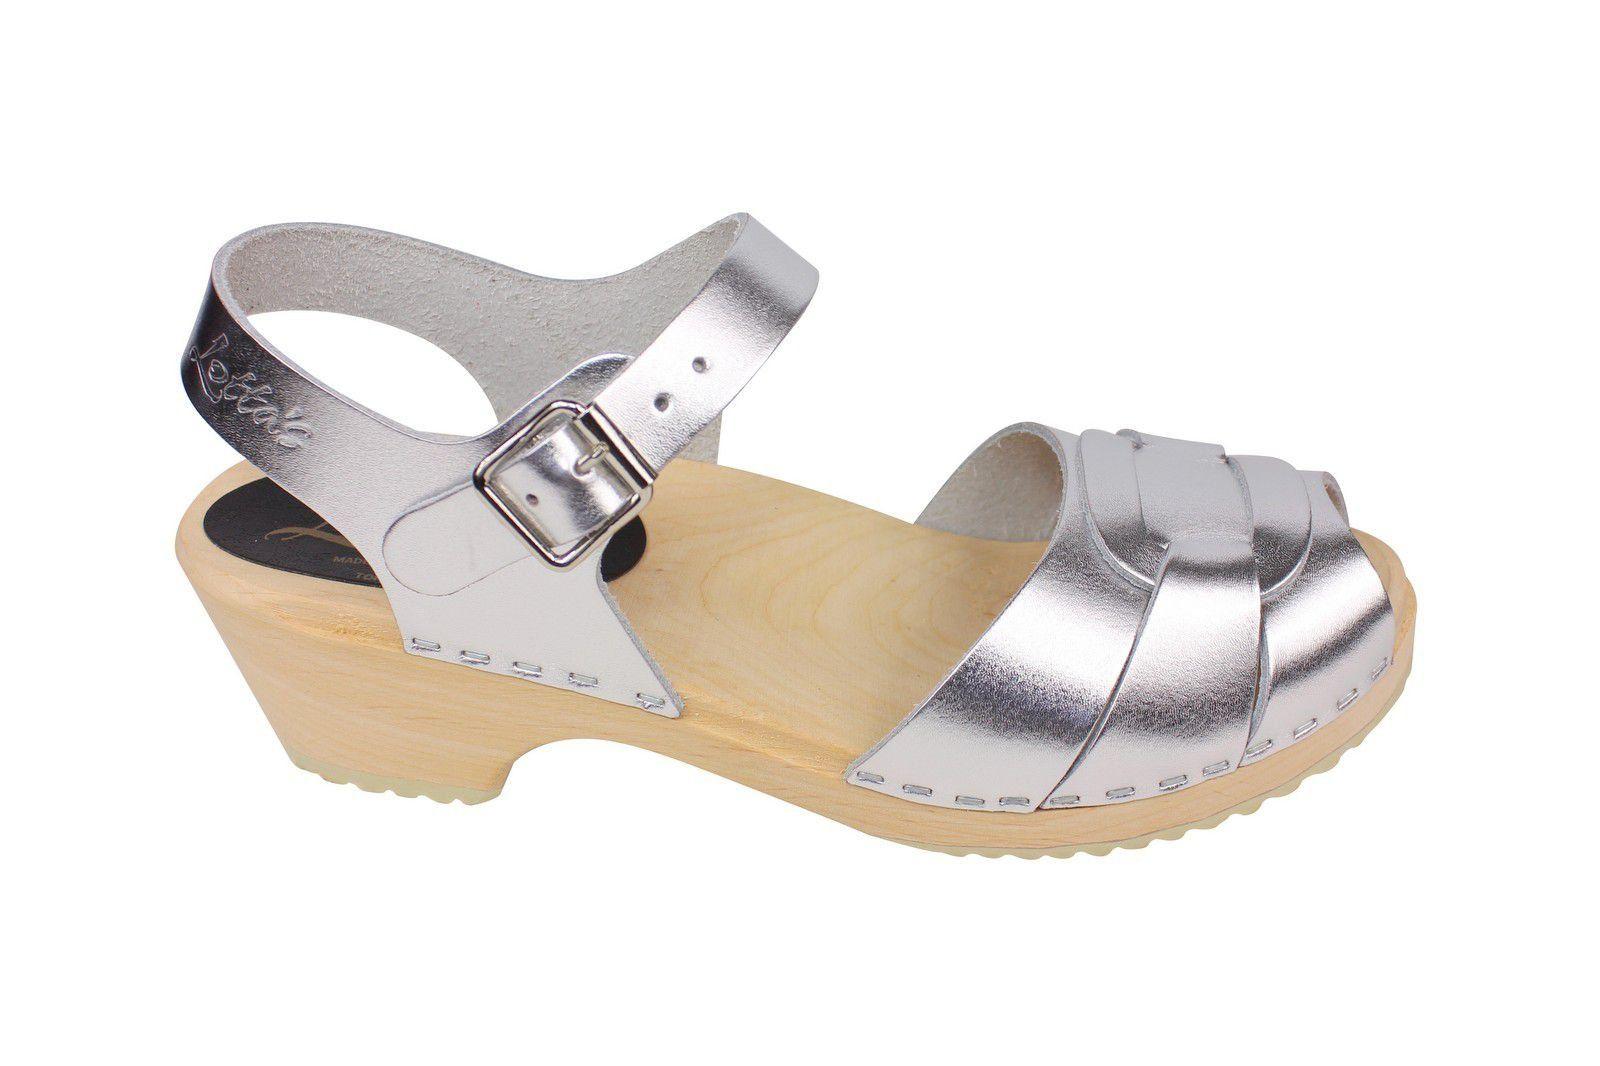 Lotta From Stockholm Low Heel Peep Toe in Silver Leather Side 2